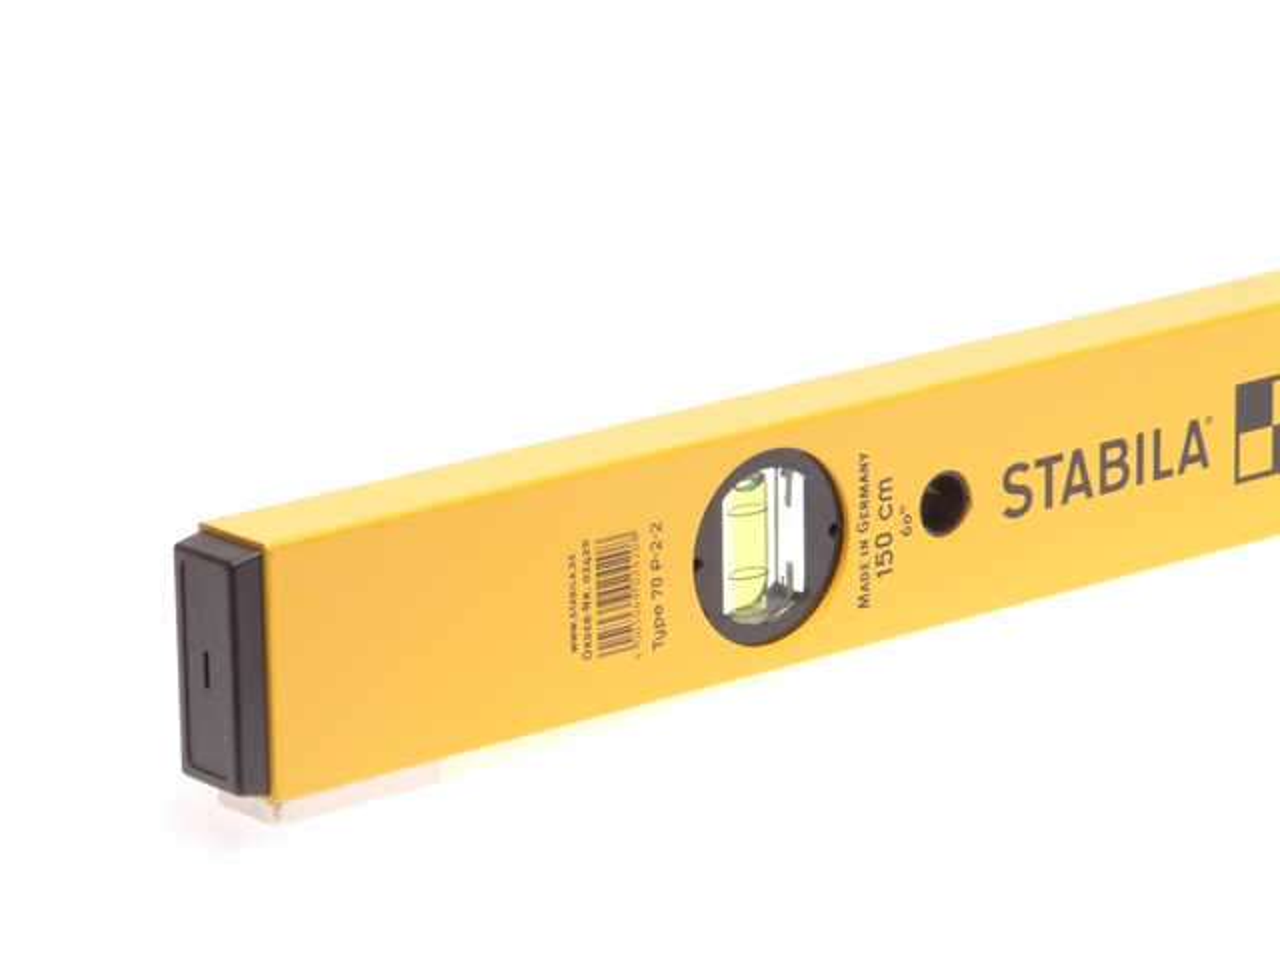 Stabila 70P-2-2 Level 200cm//78in 02422